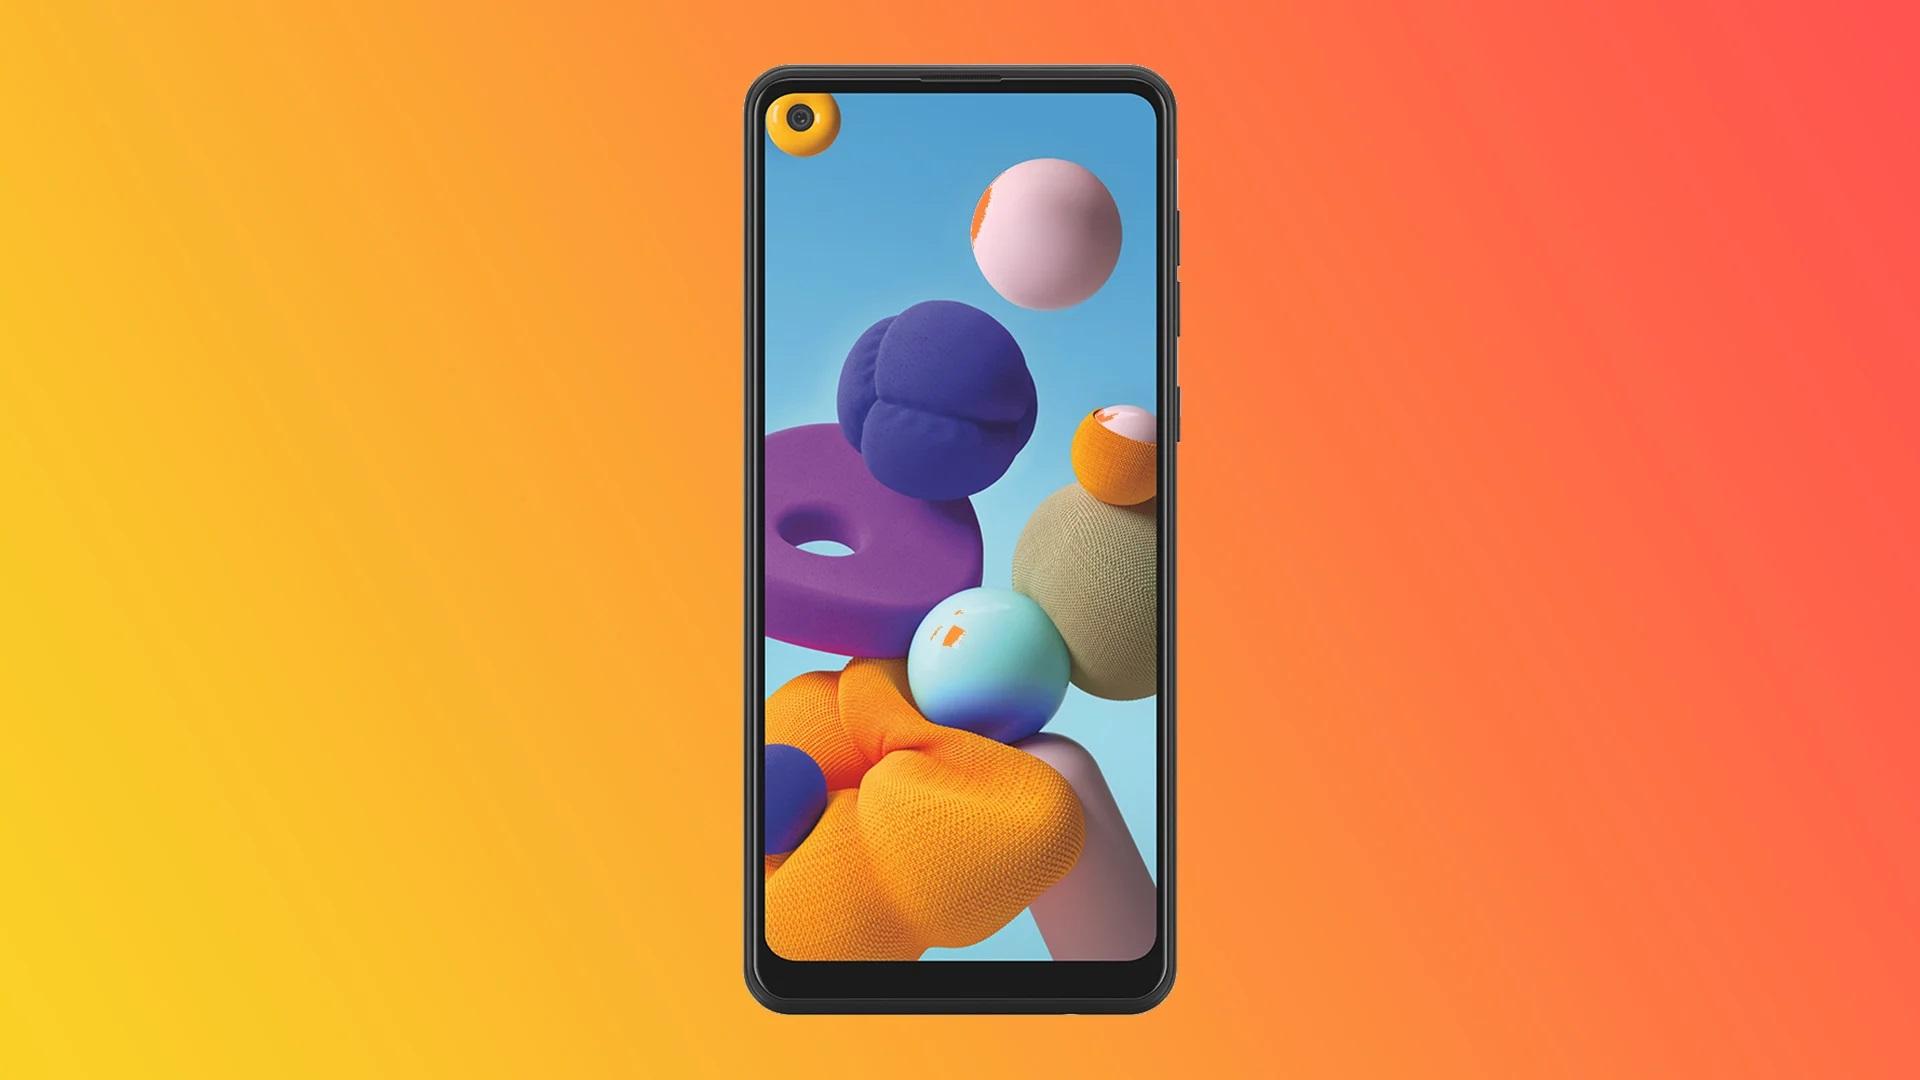 Представлен долгоиграющий бюджетный смартфон Samsung Galaxy A21s